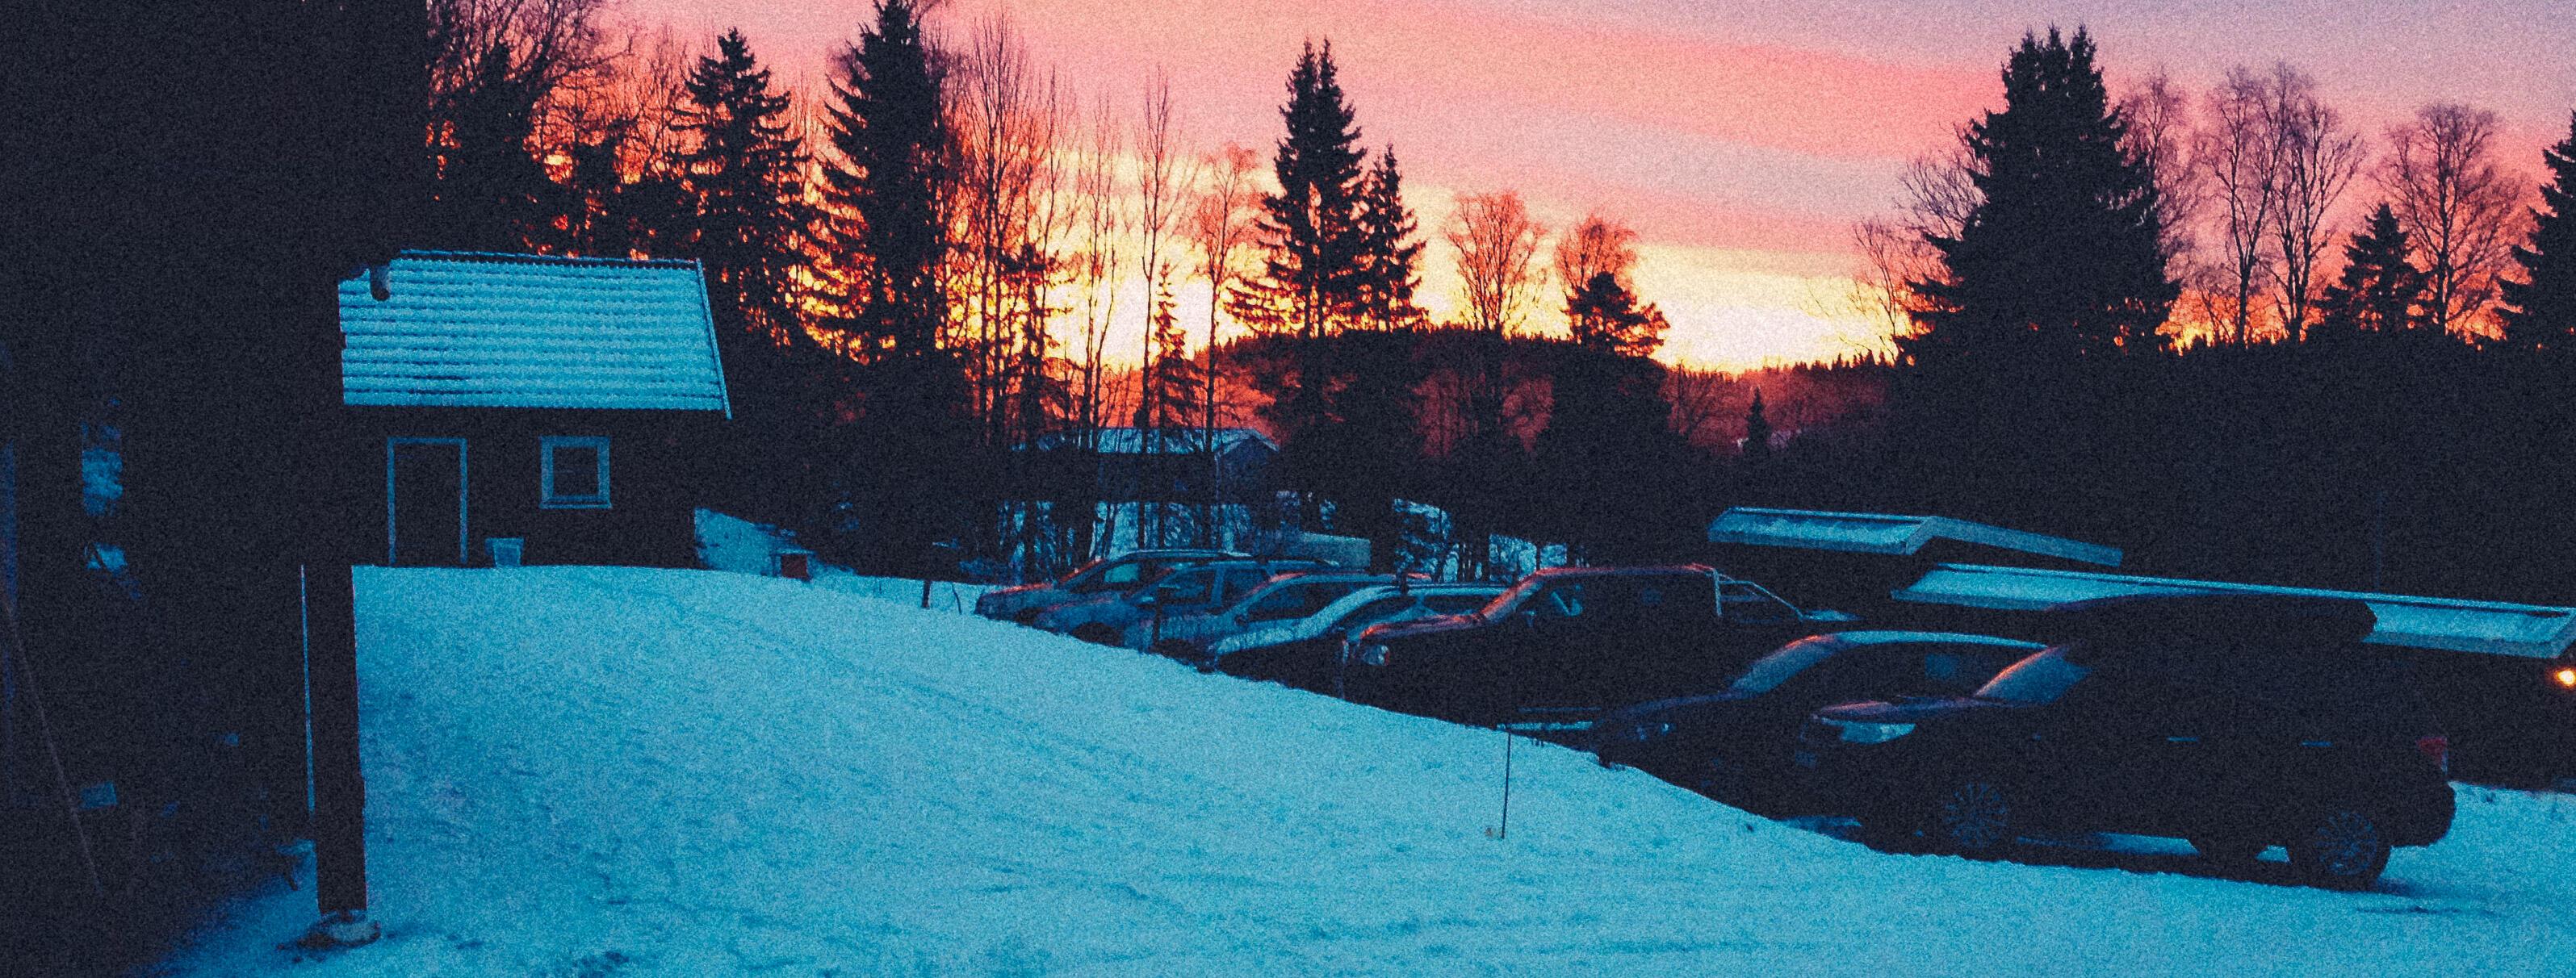 Soloppgang ved Tyrilihaugen øst for Lillehammer.